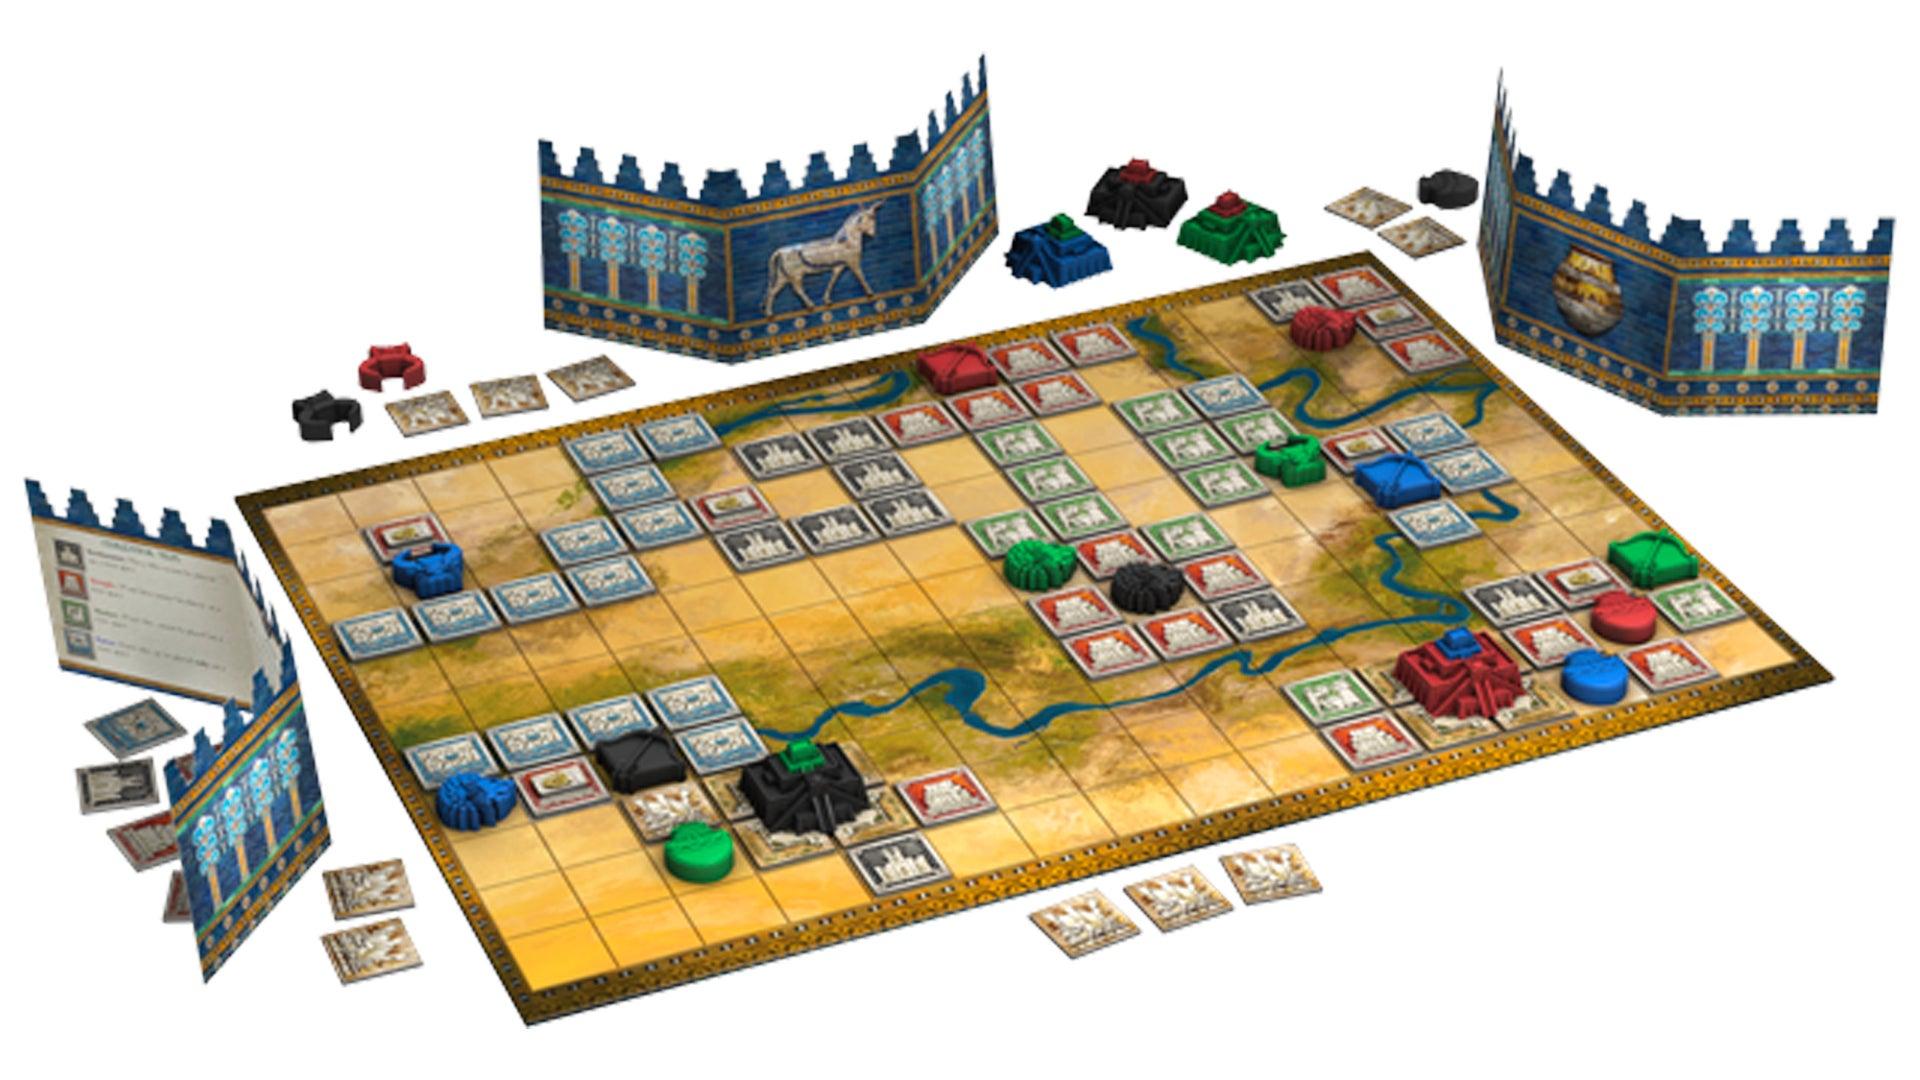 tigris-and-euphrates-board-game-gameplay-layout.jpg